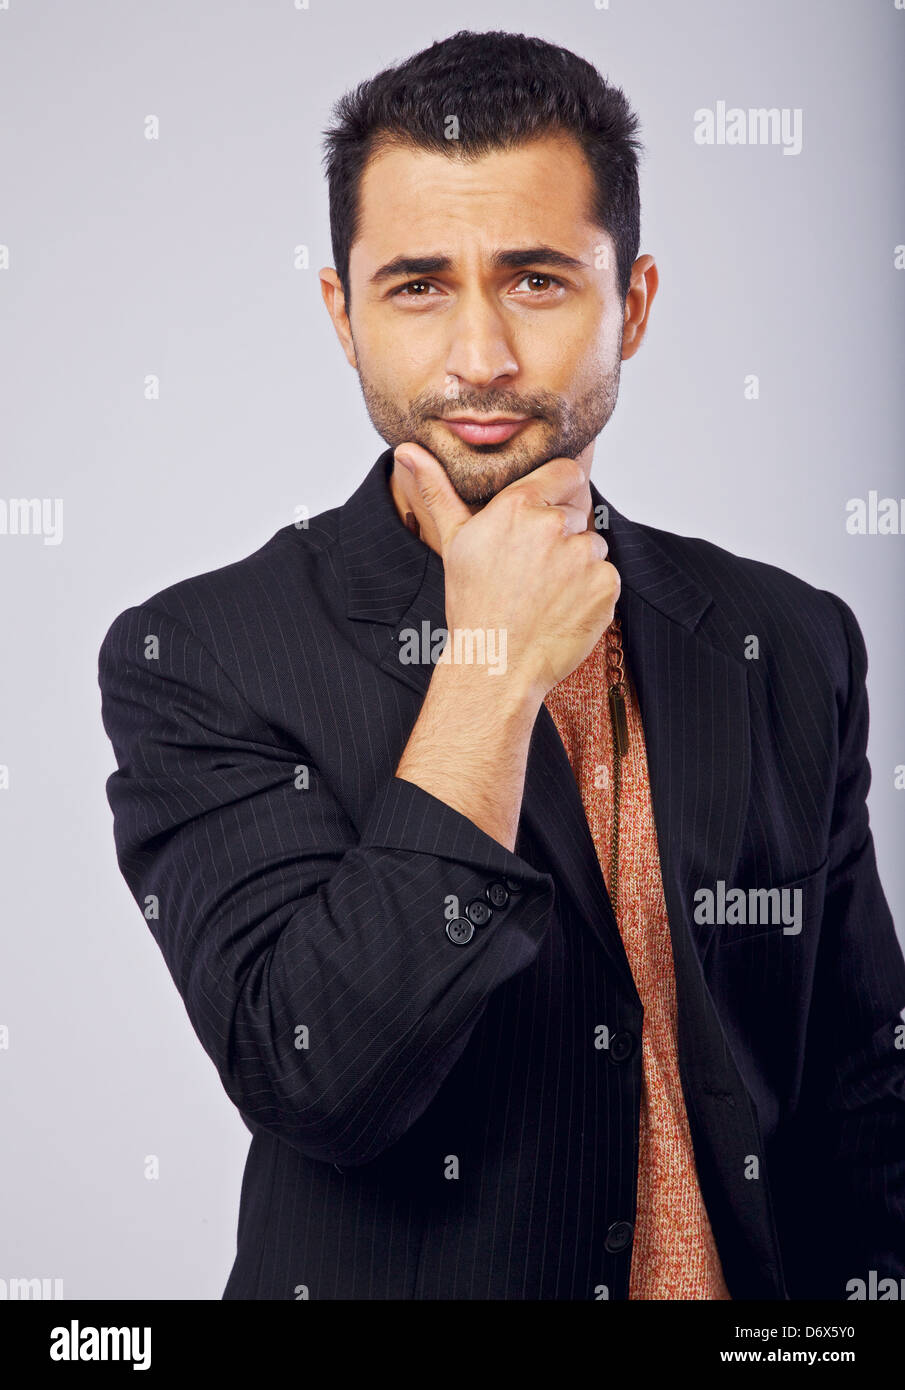 Arrogant handsome man posing in a studio Photo Stock